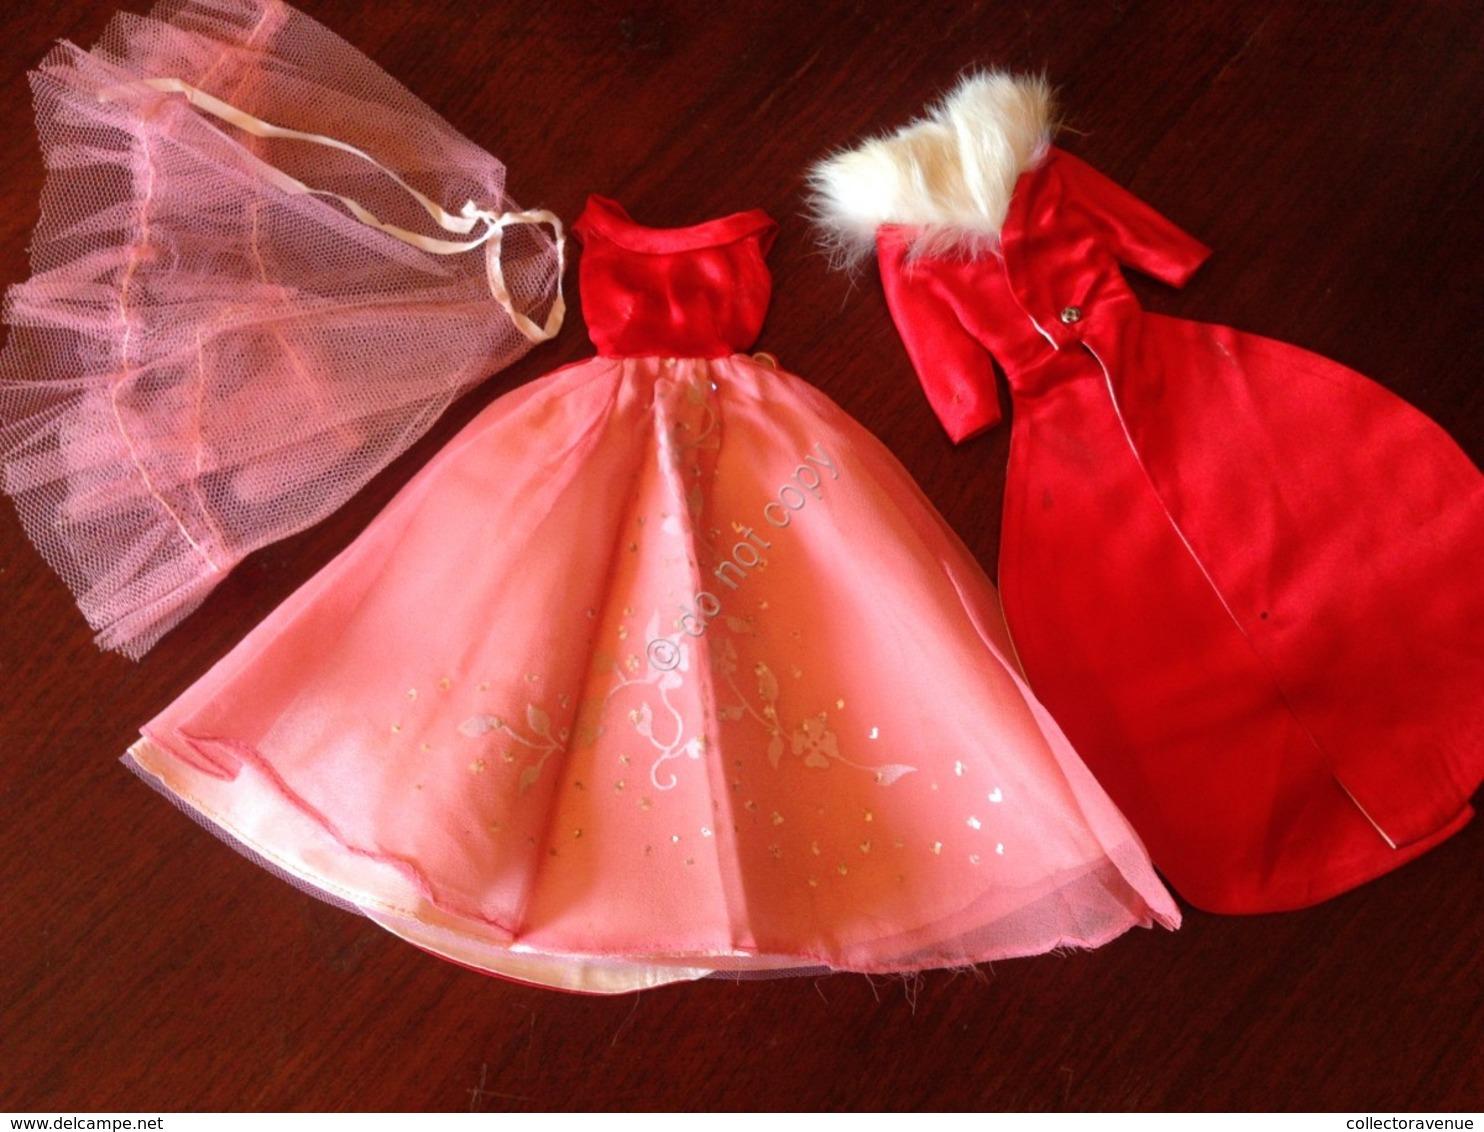 ORIGINAL BARBIE VINTAGE CLOTH # 1646 Magnificience 1965 - Barbie